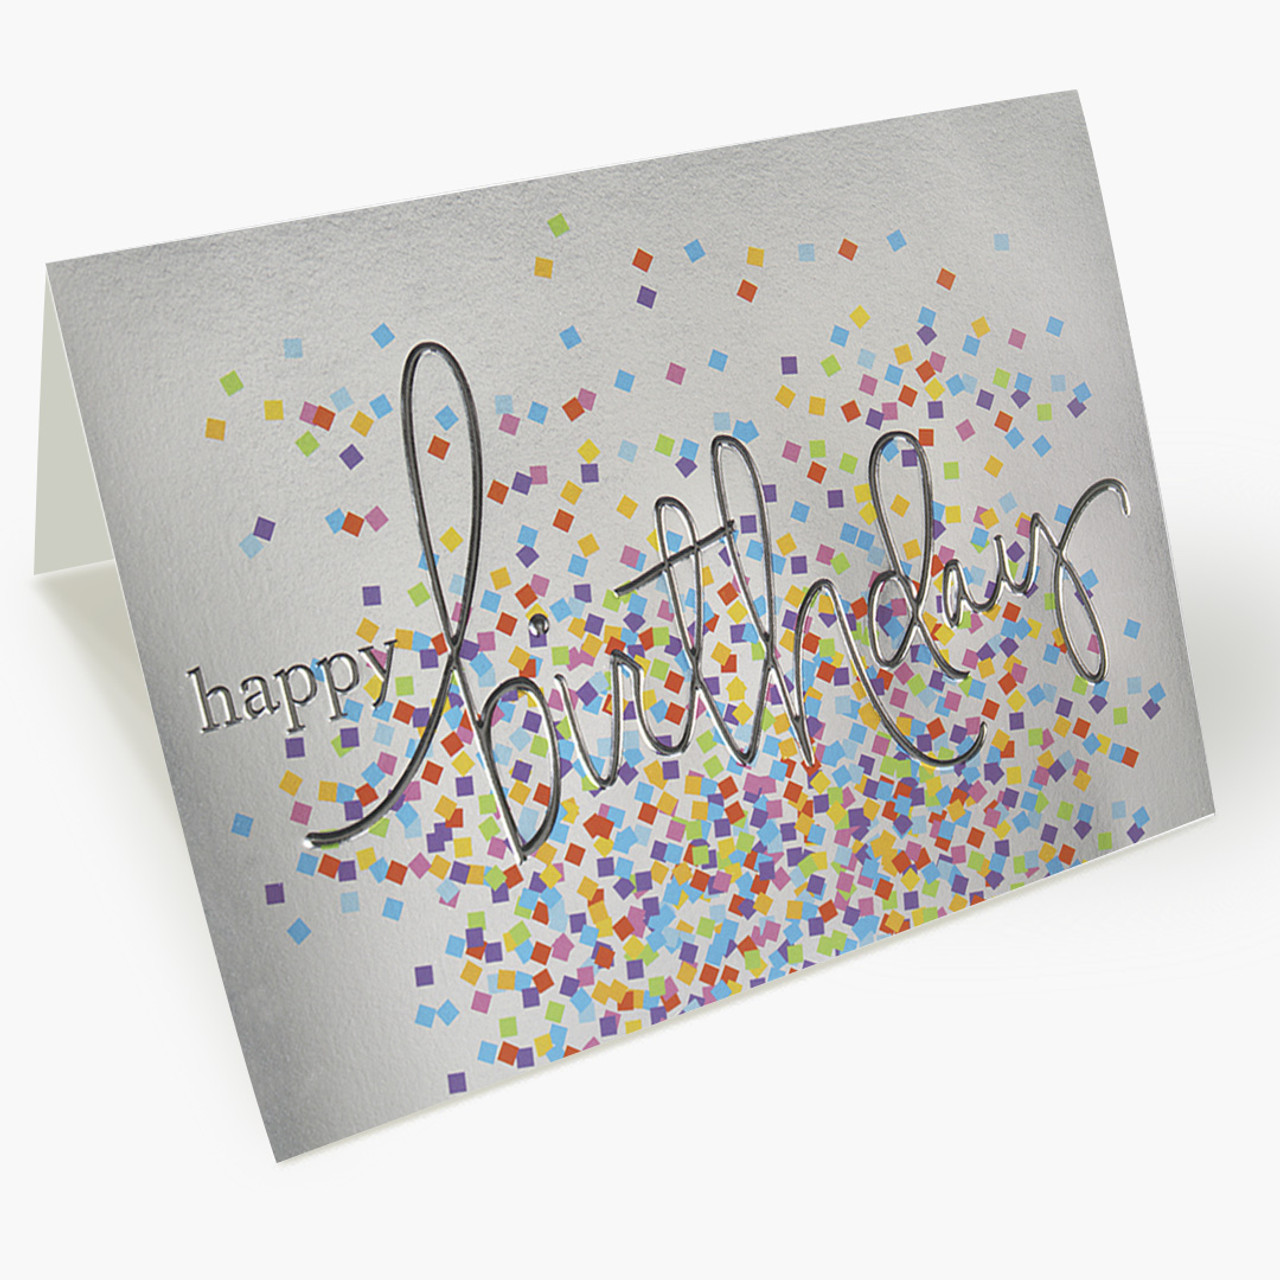 Colorful Confetti Birthday Card